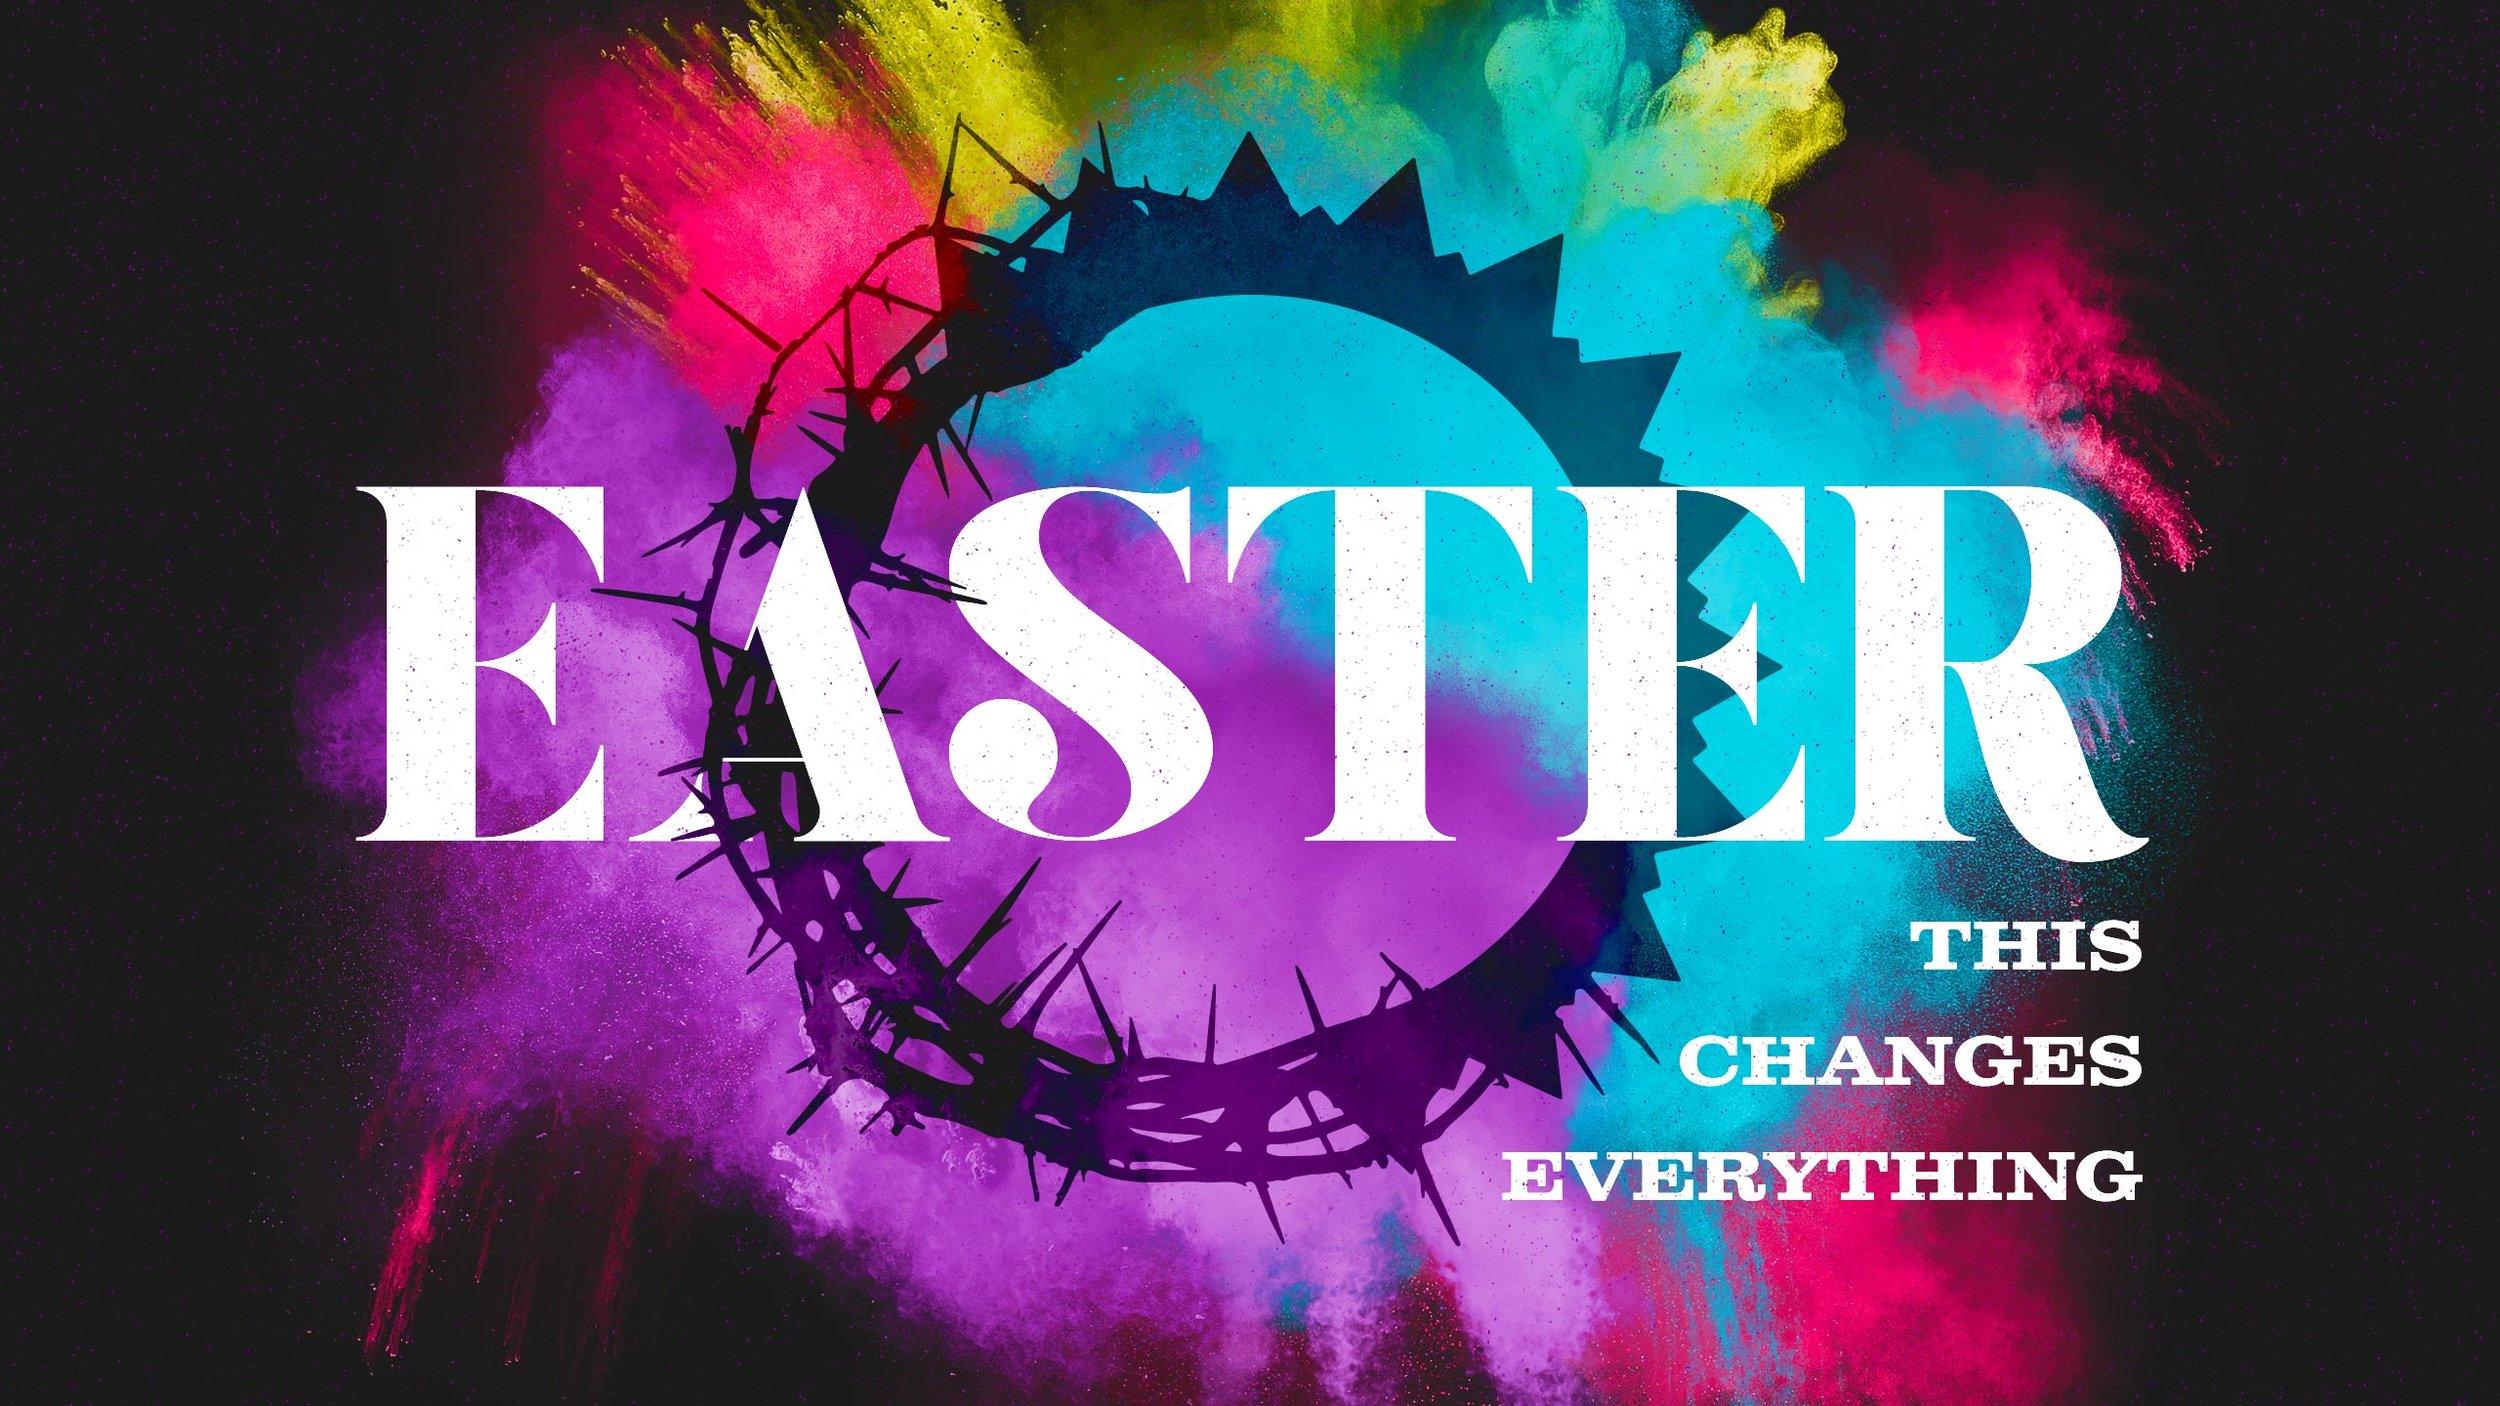 TITLE-Easter2019-ver4.jpg